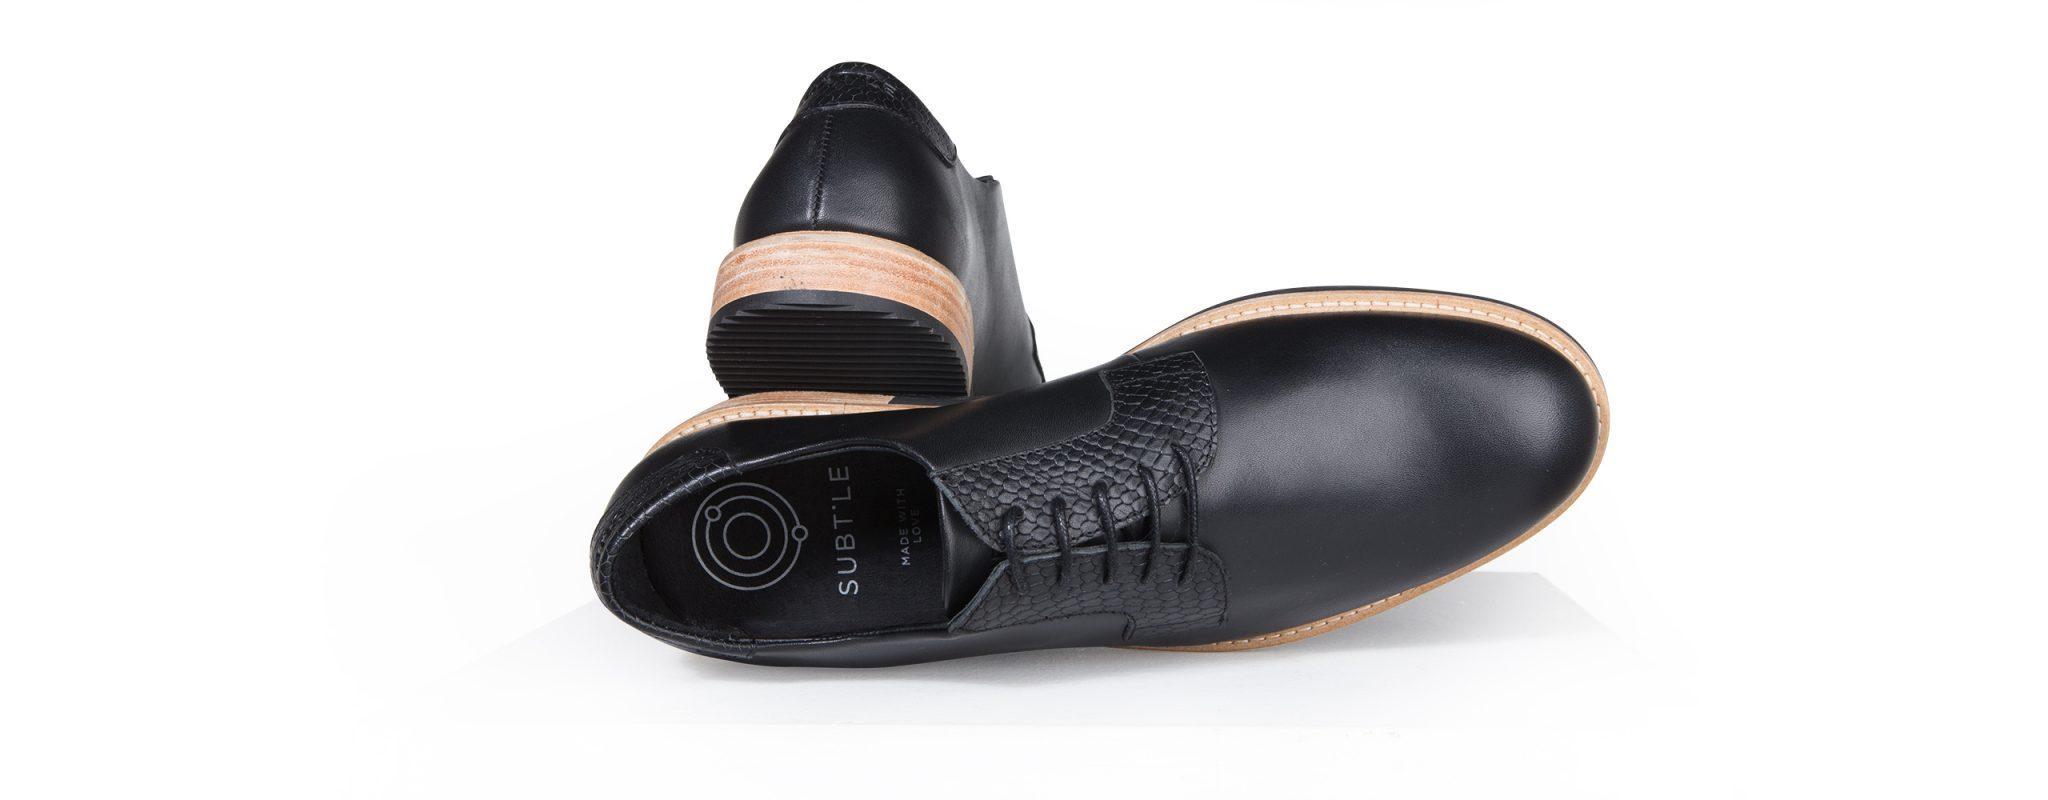 chaussure derby homme cuir noir subtle shoes. Black Bedroom Furniture Sets. Home Design Ideas